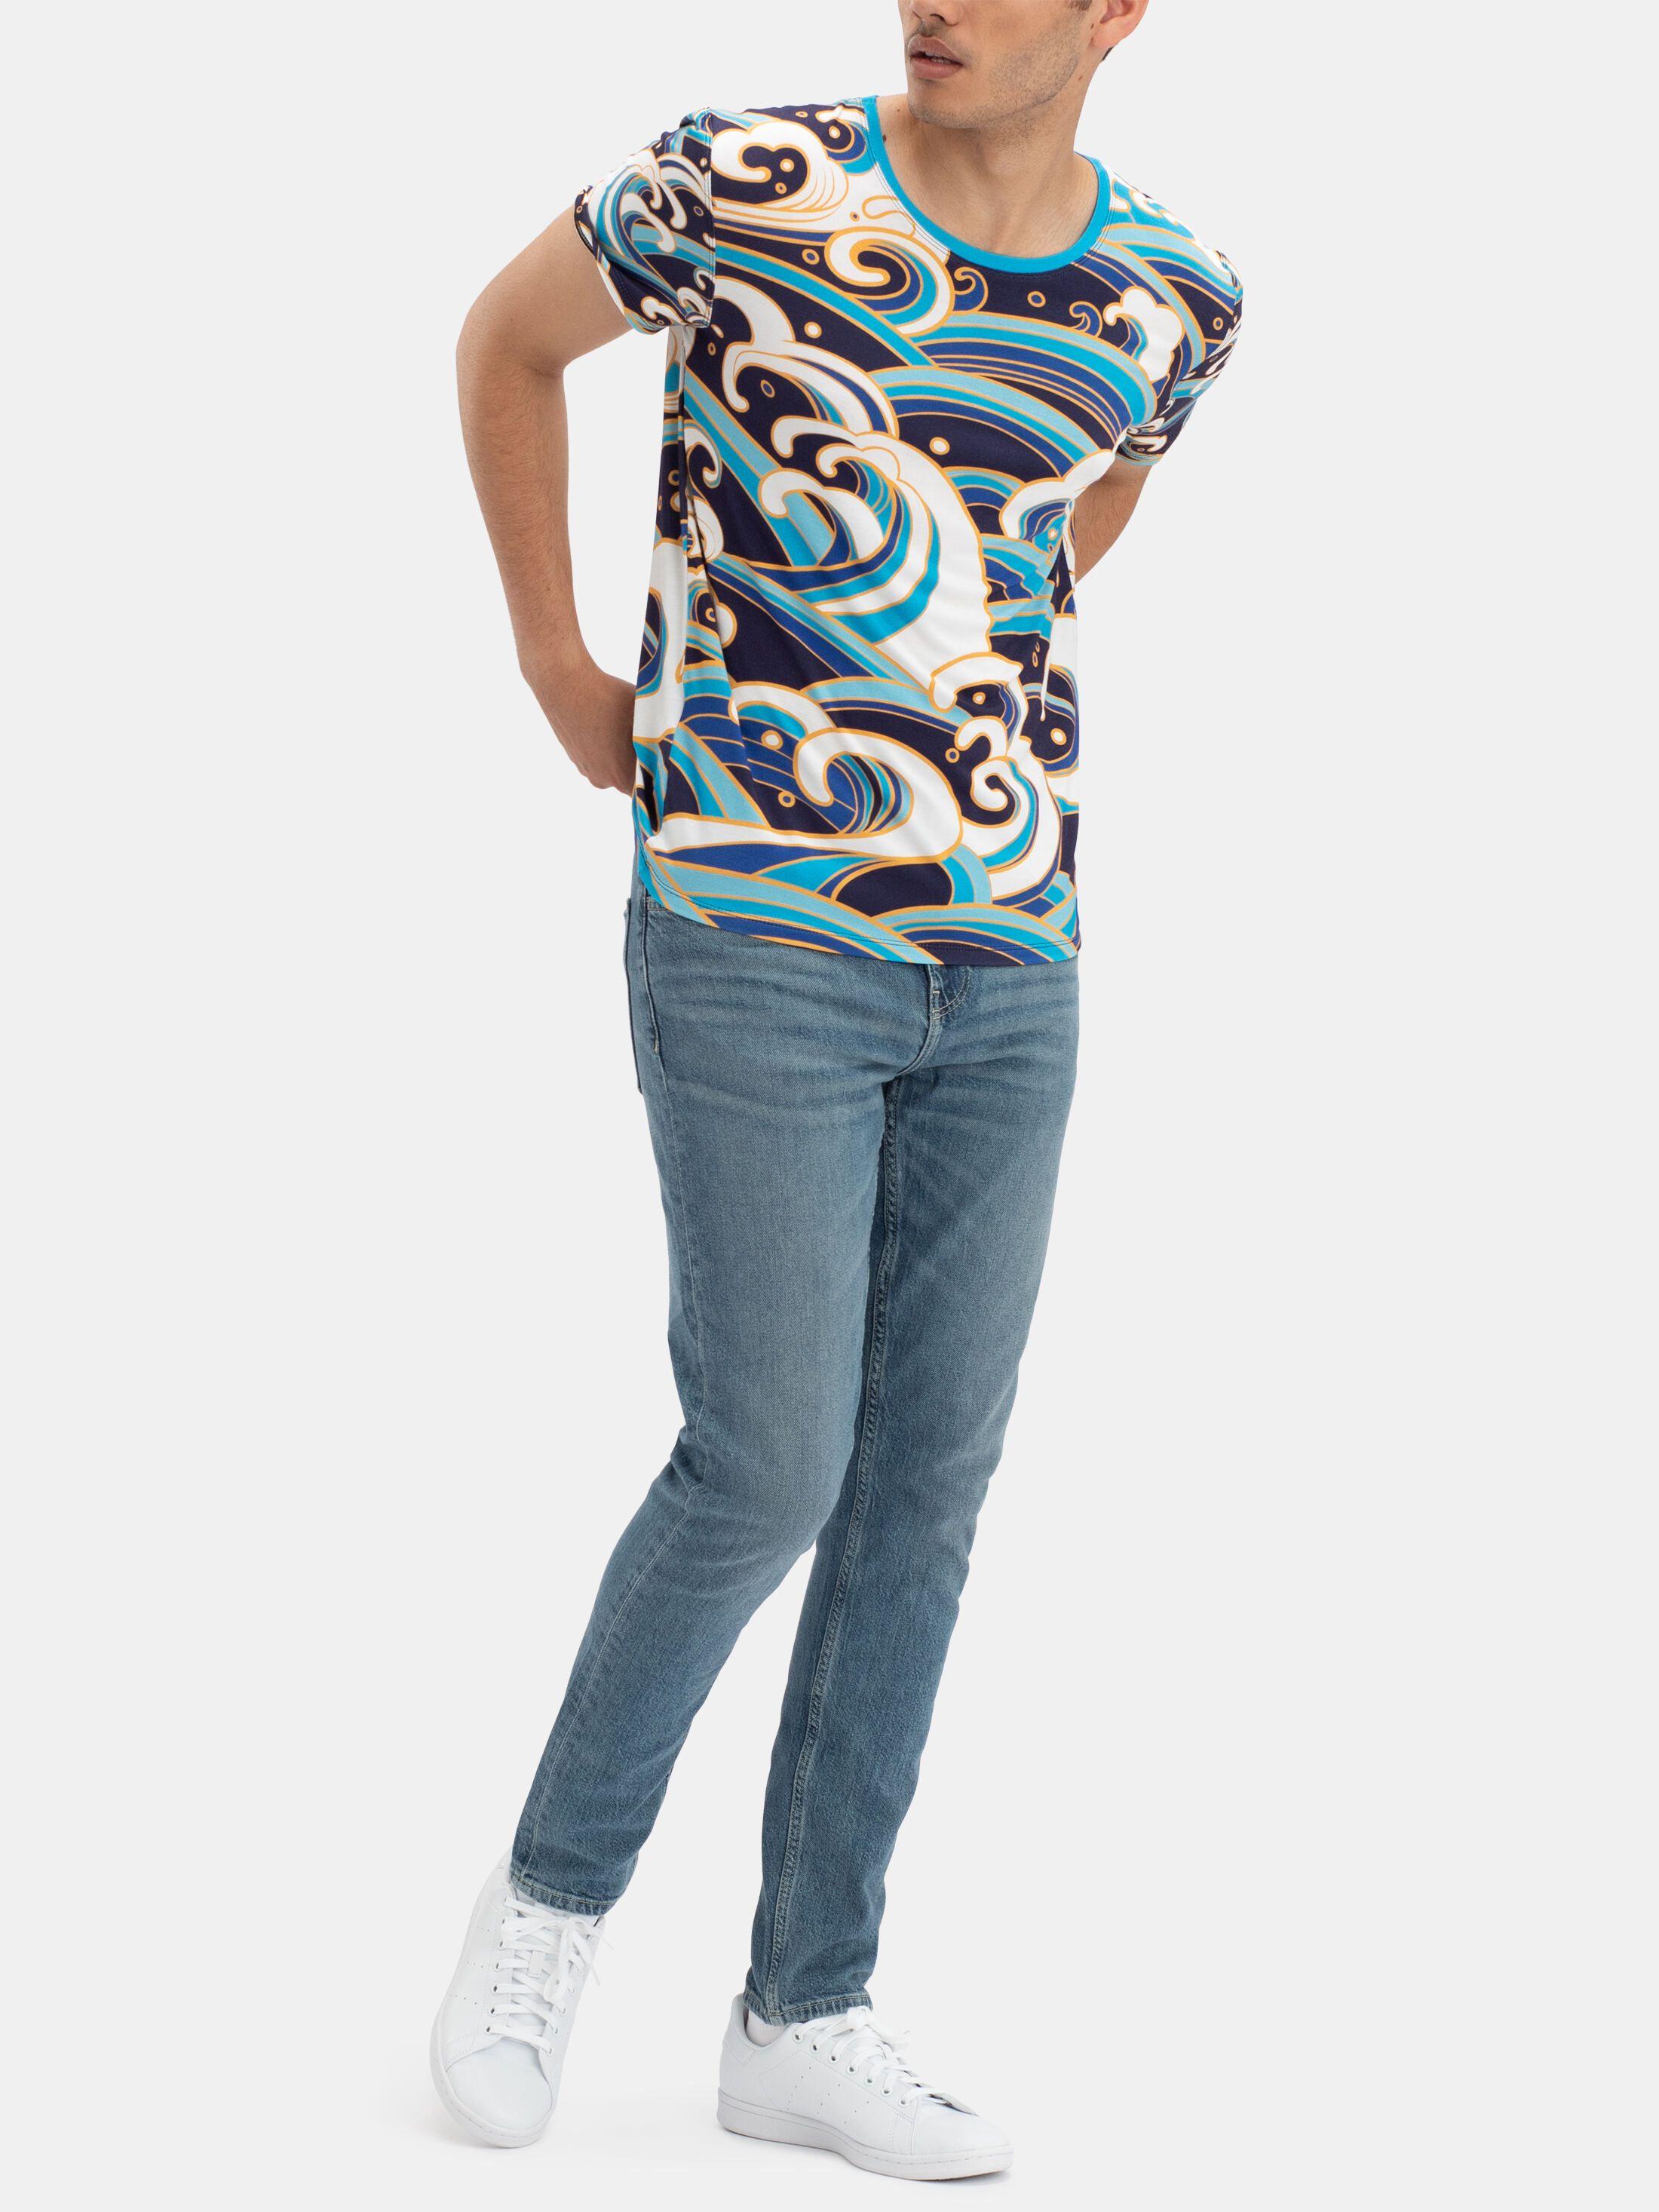 Men's Custom Crew Neck T-Shirt